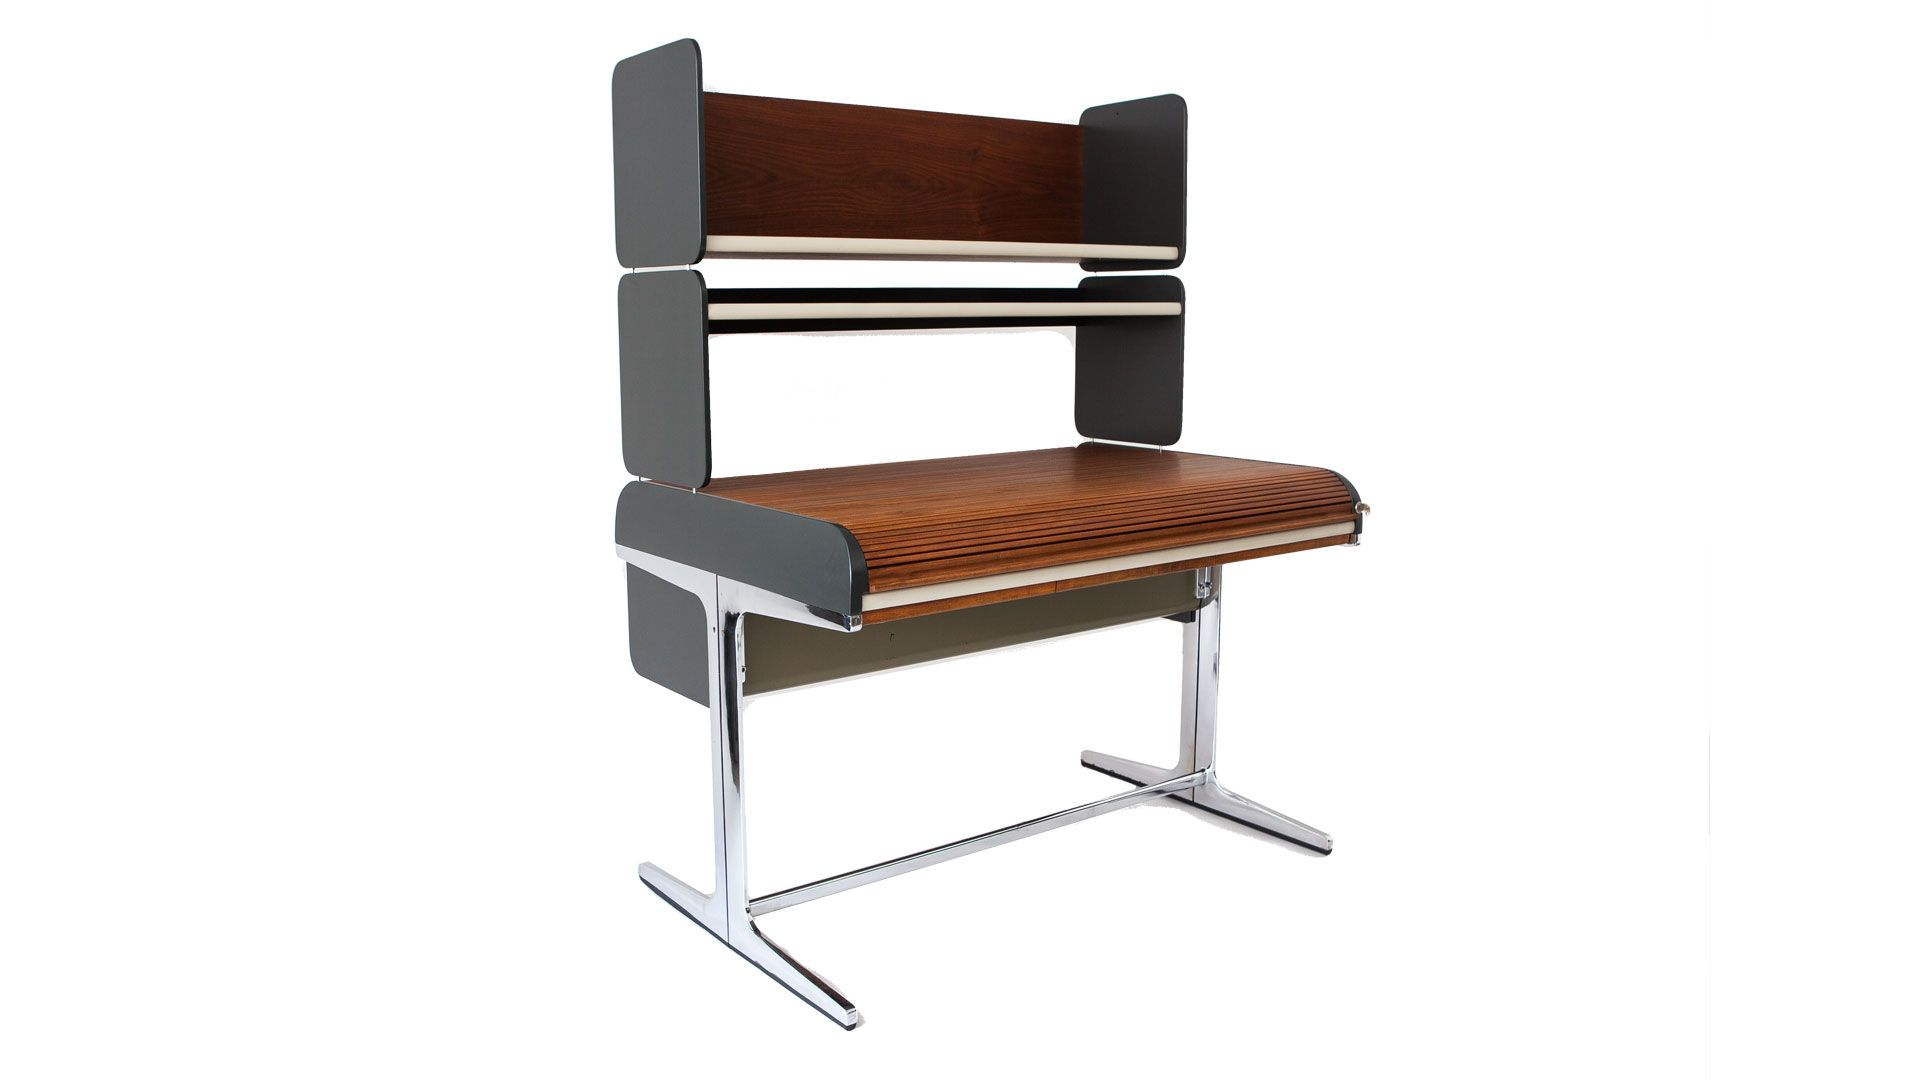 herman miller office desk. tall action office desk by george nelson for herman miller 1964 l